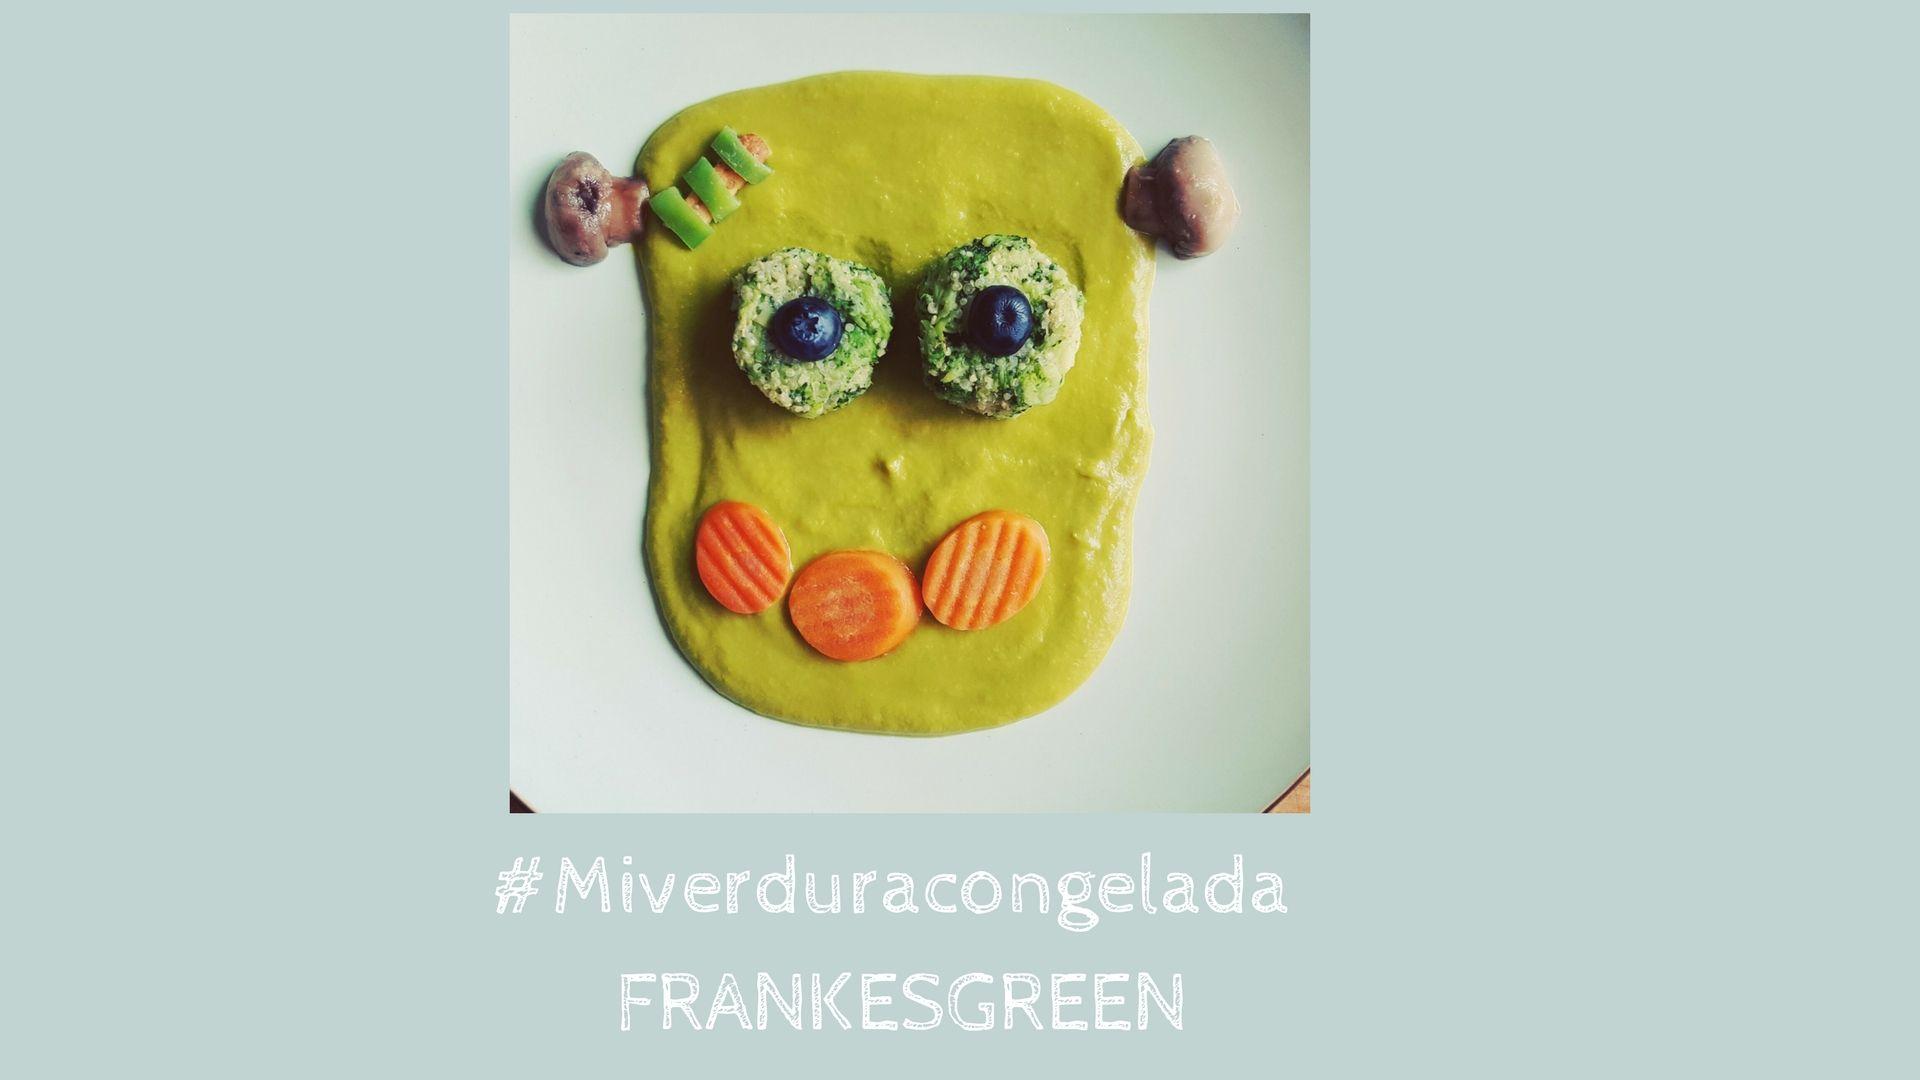 Frankesgreen / Receta de verduras, divertida para niños